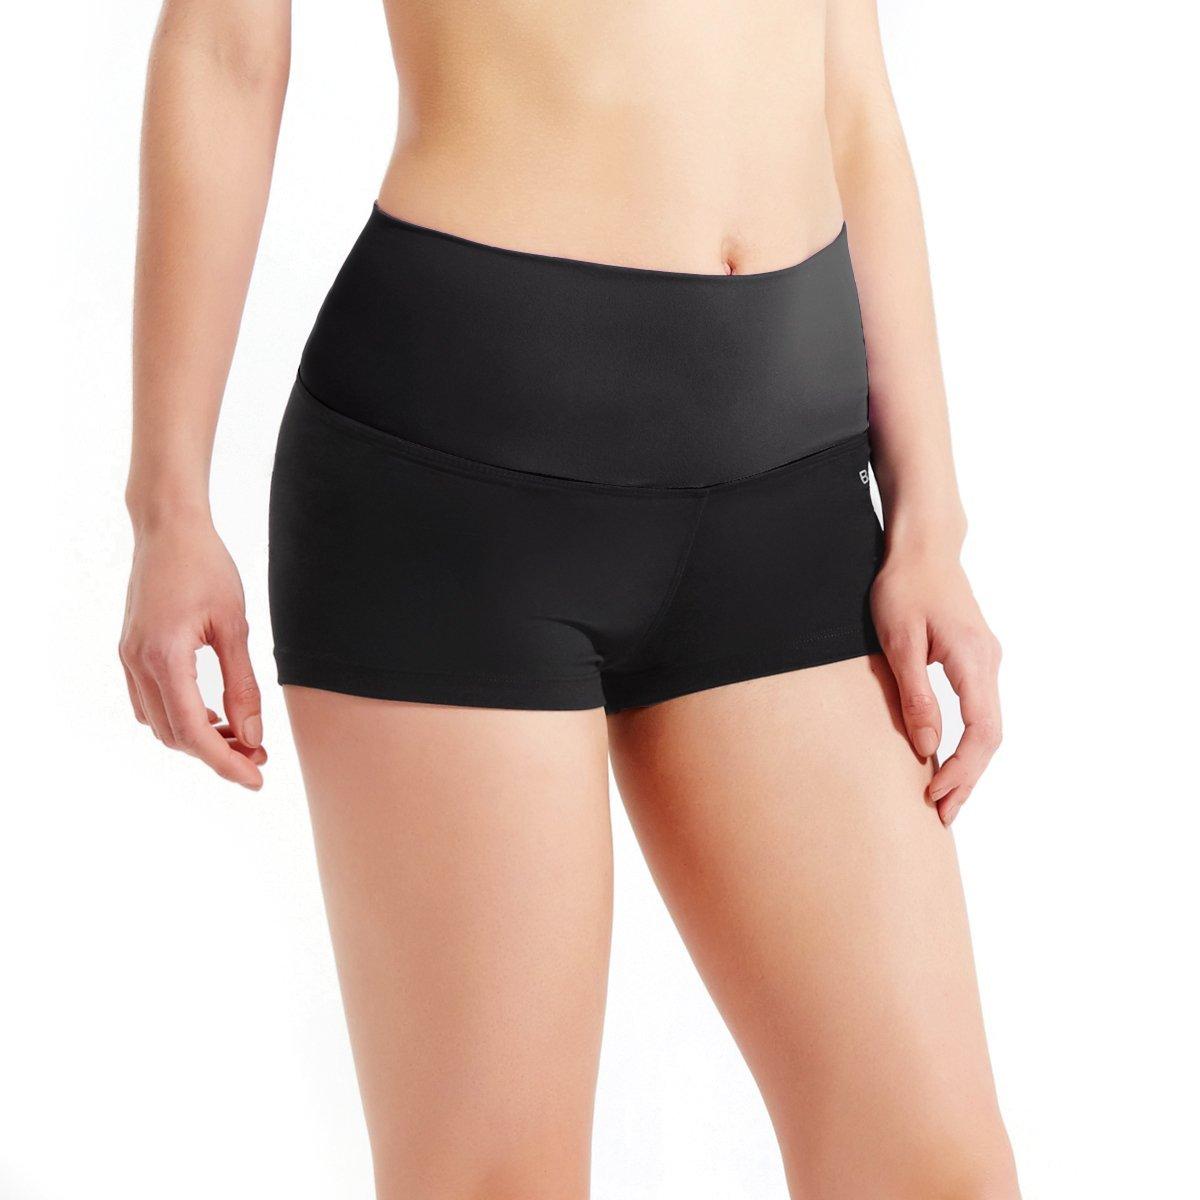 BALEAF Women's High Waisted Seamless Yoga Shorts Stretch Workout Athletic Hiking Shorts Back Pocket Navy Size L